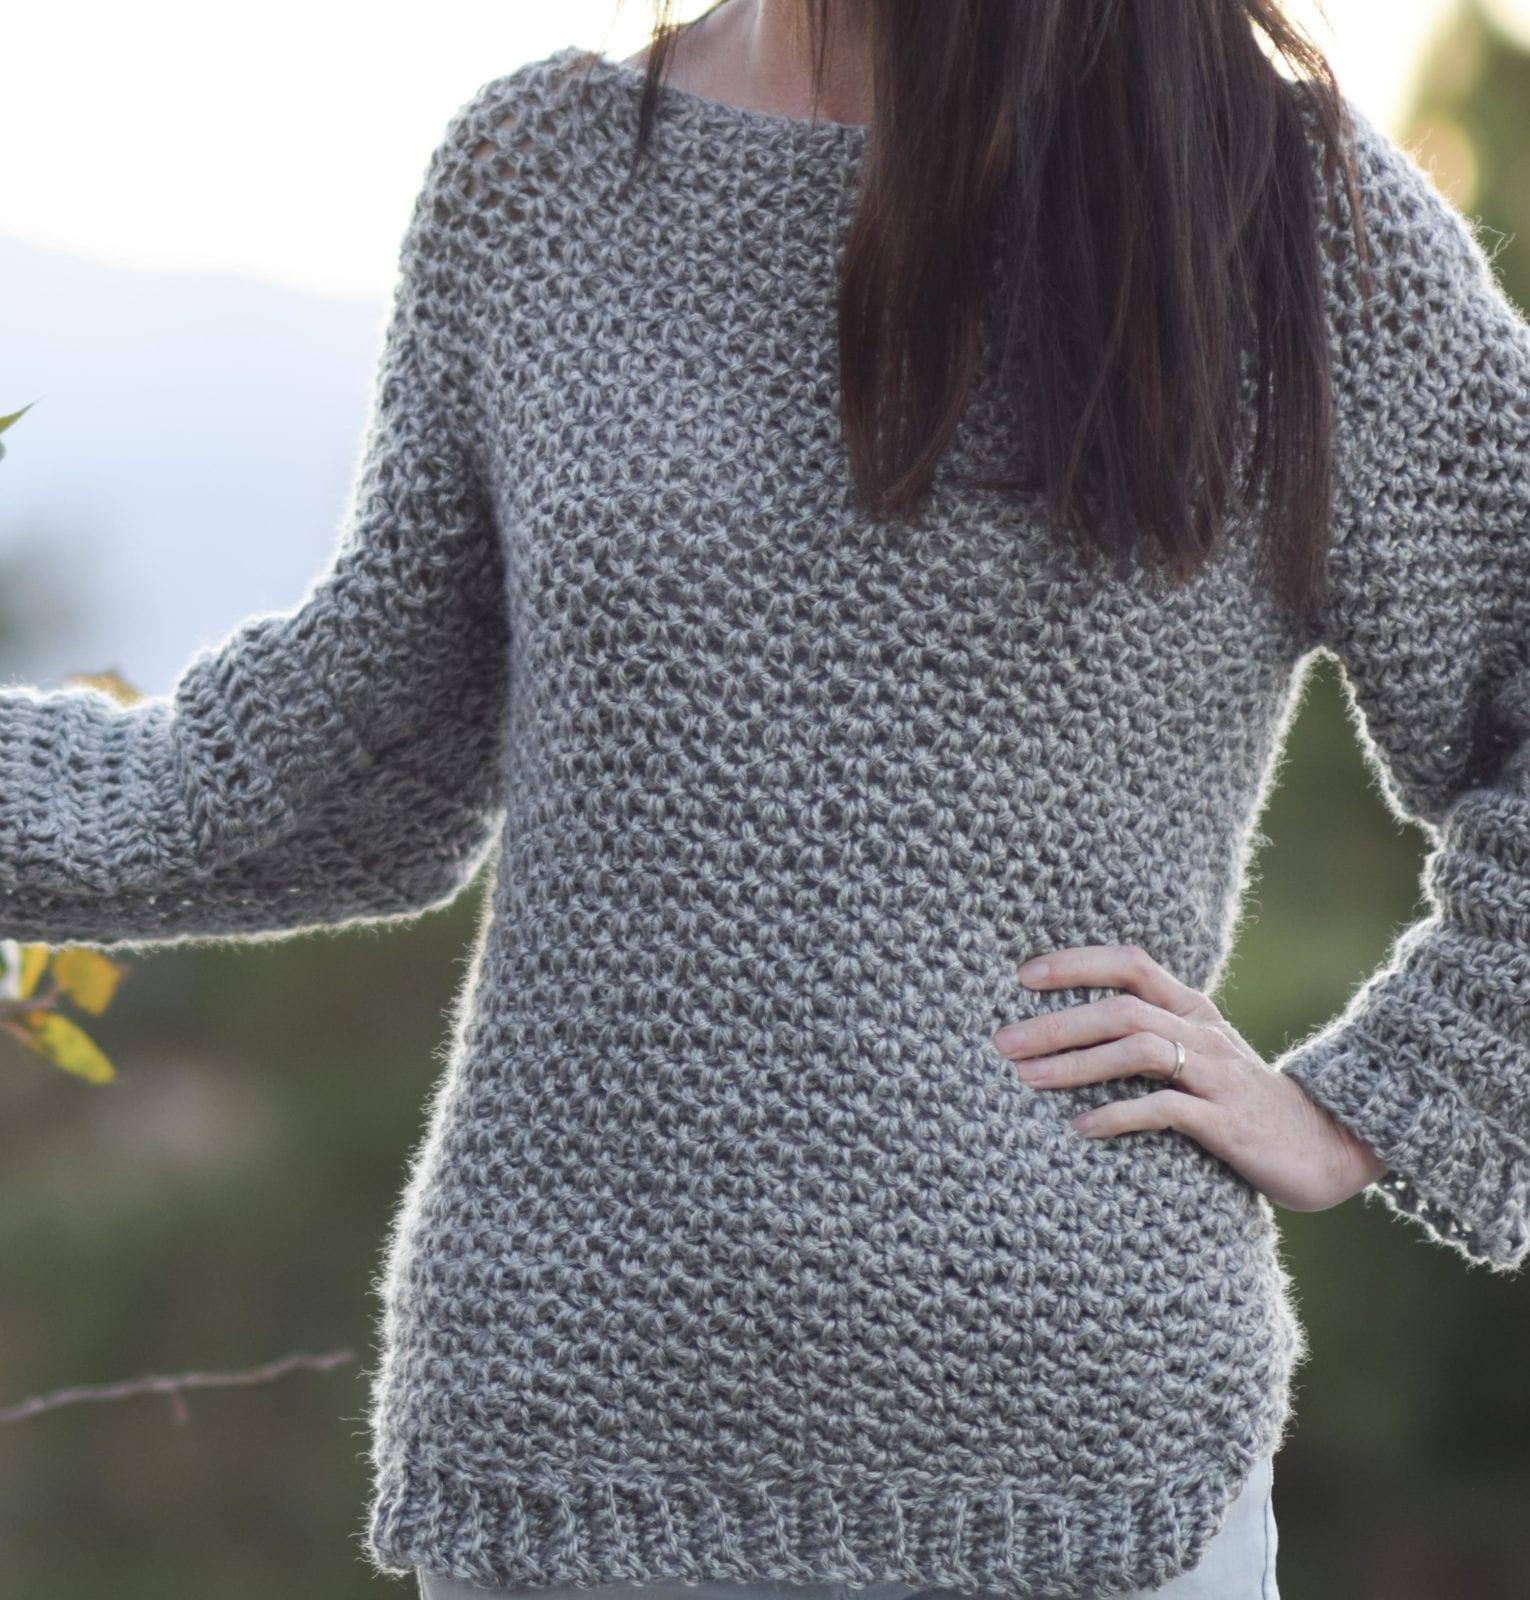 Free Crochet Patterns Interesting Design